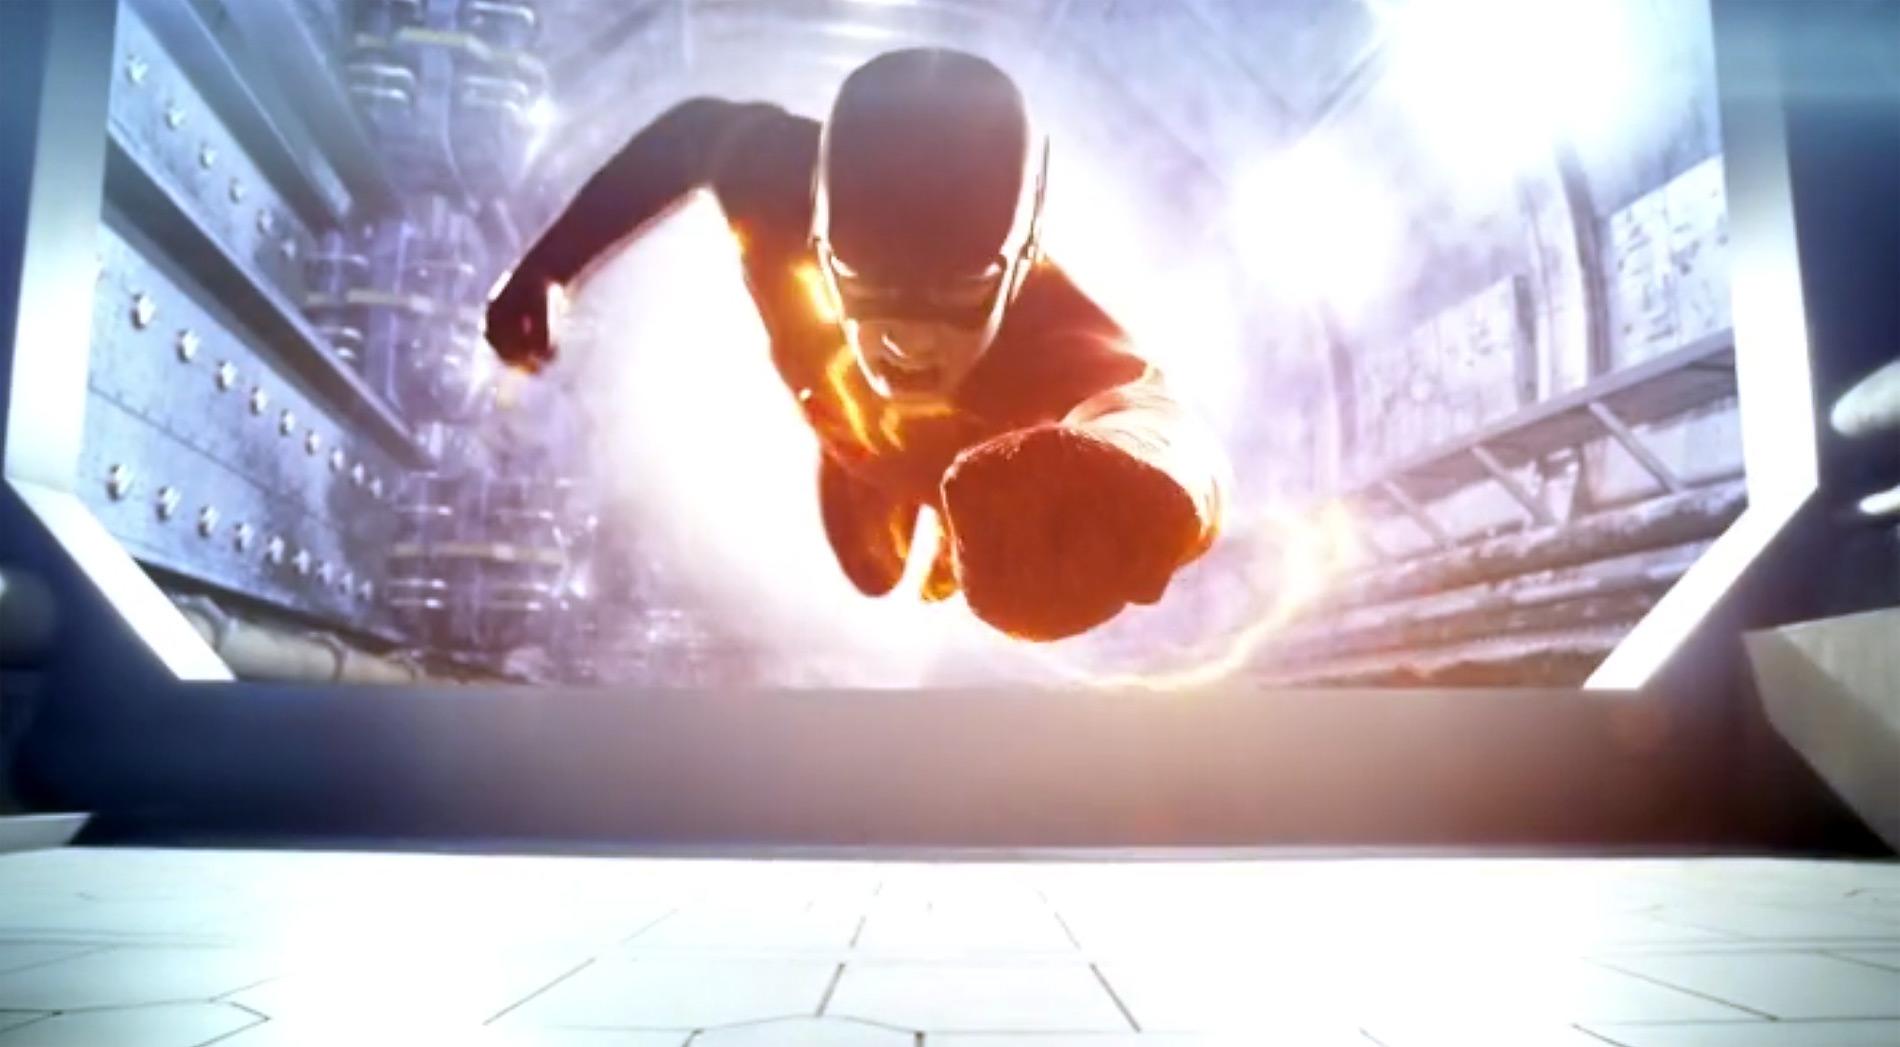 Video: The Flash Episode 1 23 Recap - That Shelf